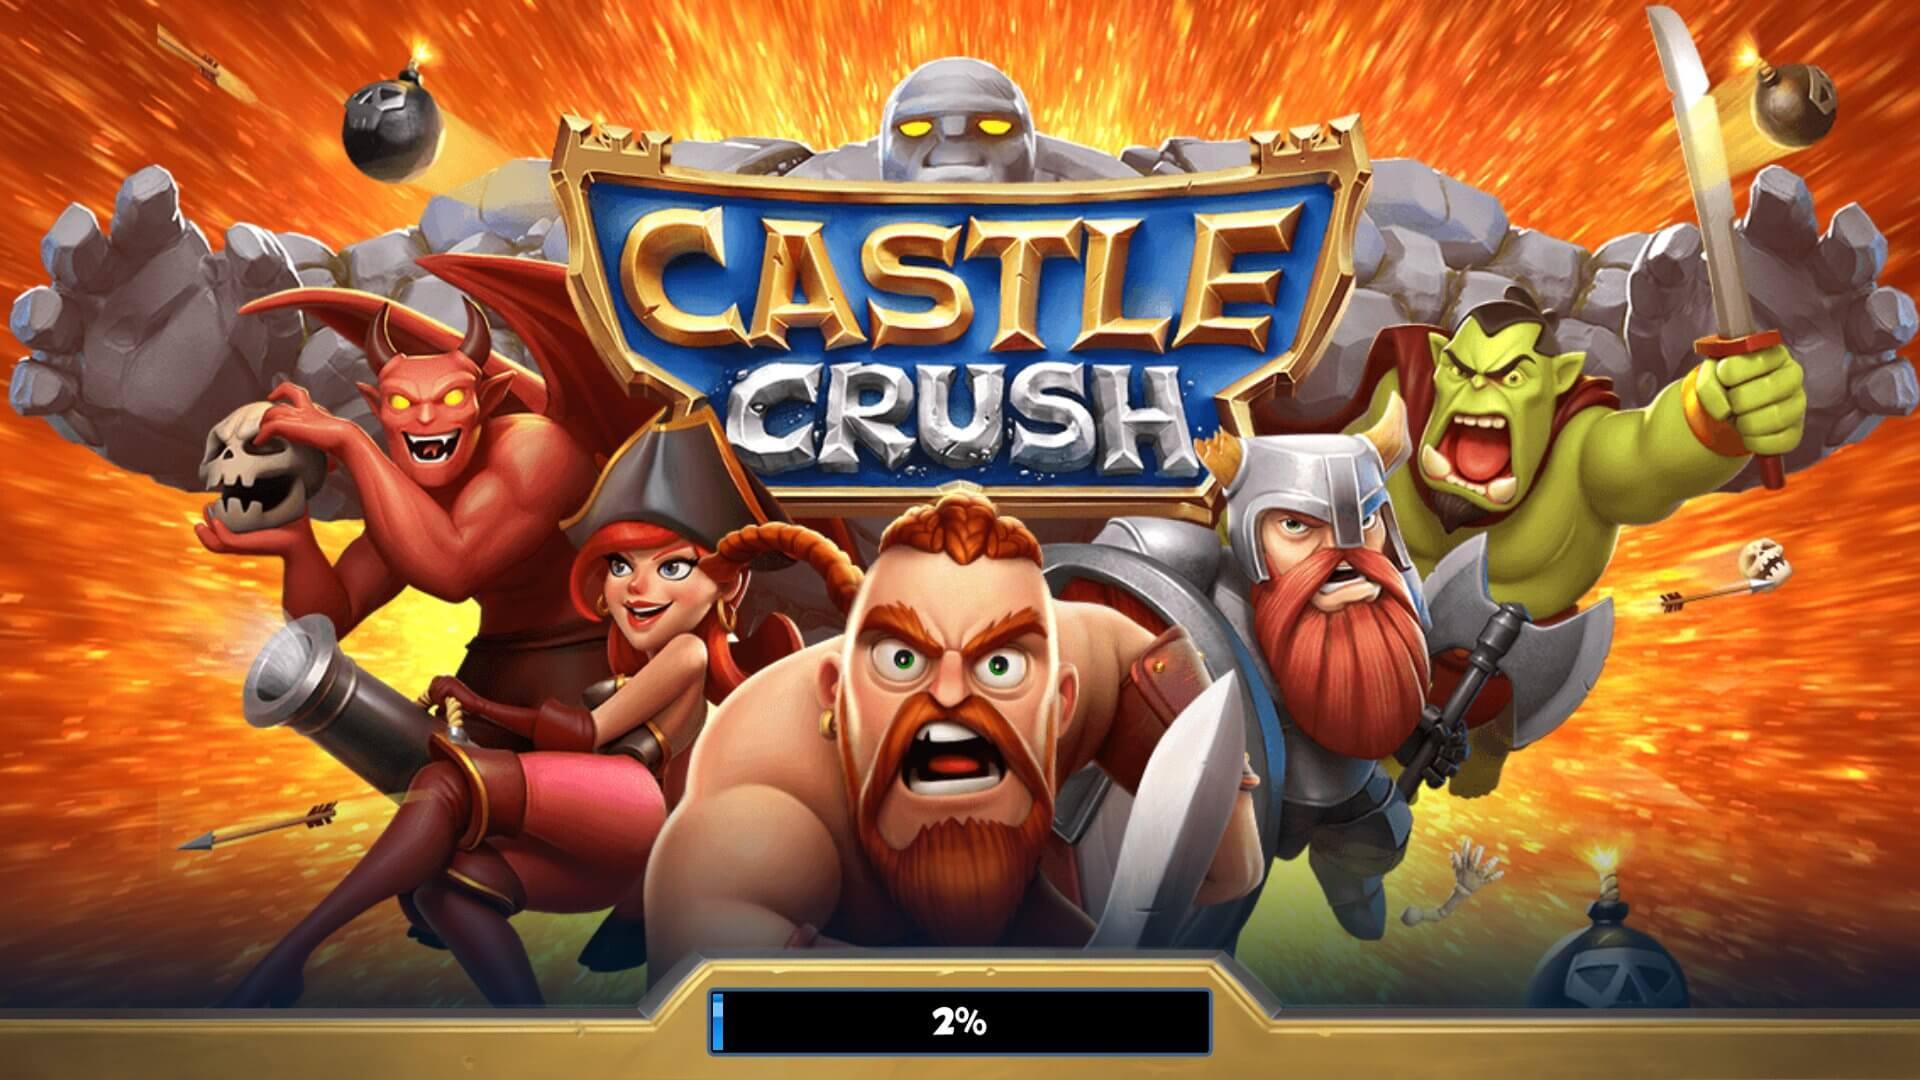 Castle Crush Mod APK v4 1 5 [Hack and Unlimited Cheats] - RoboModo